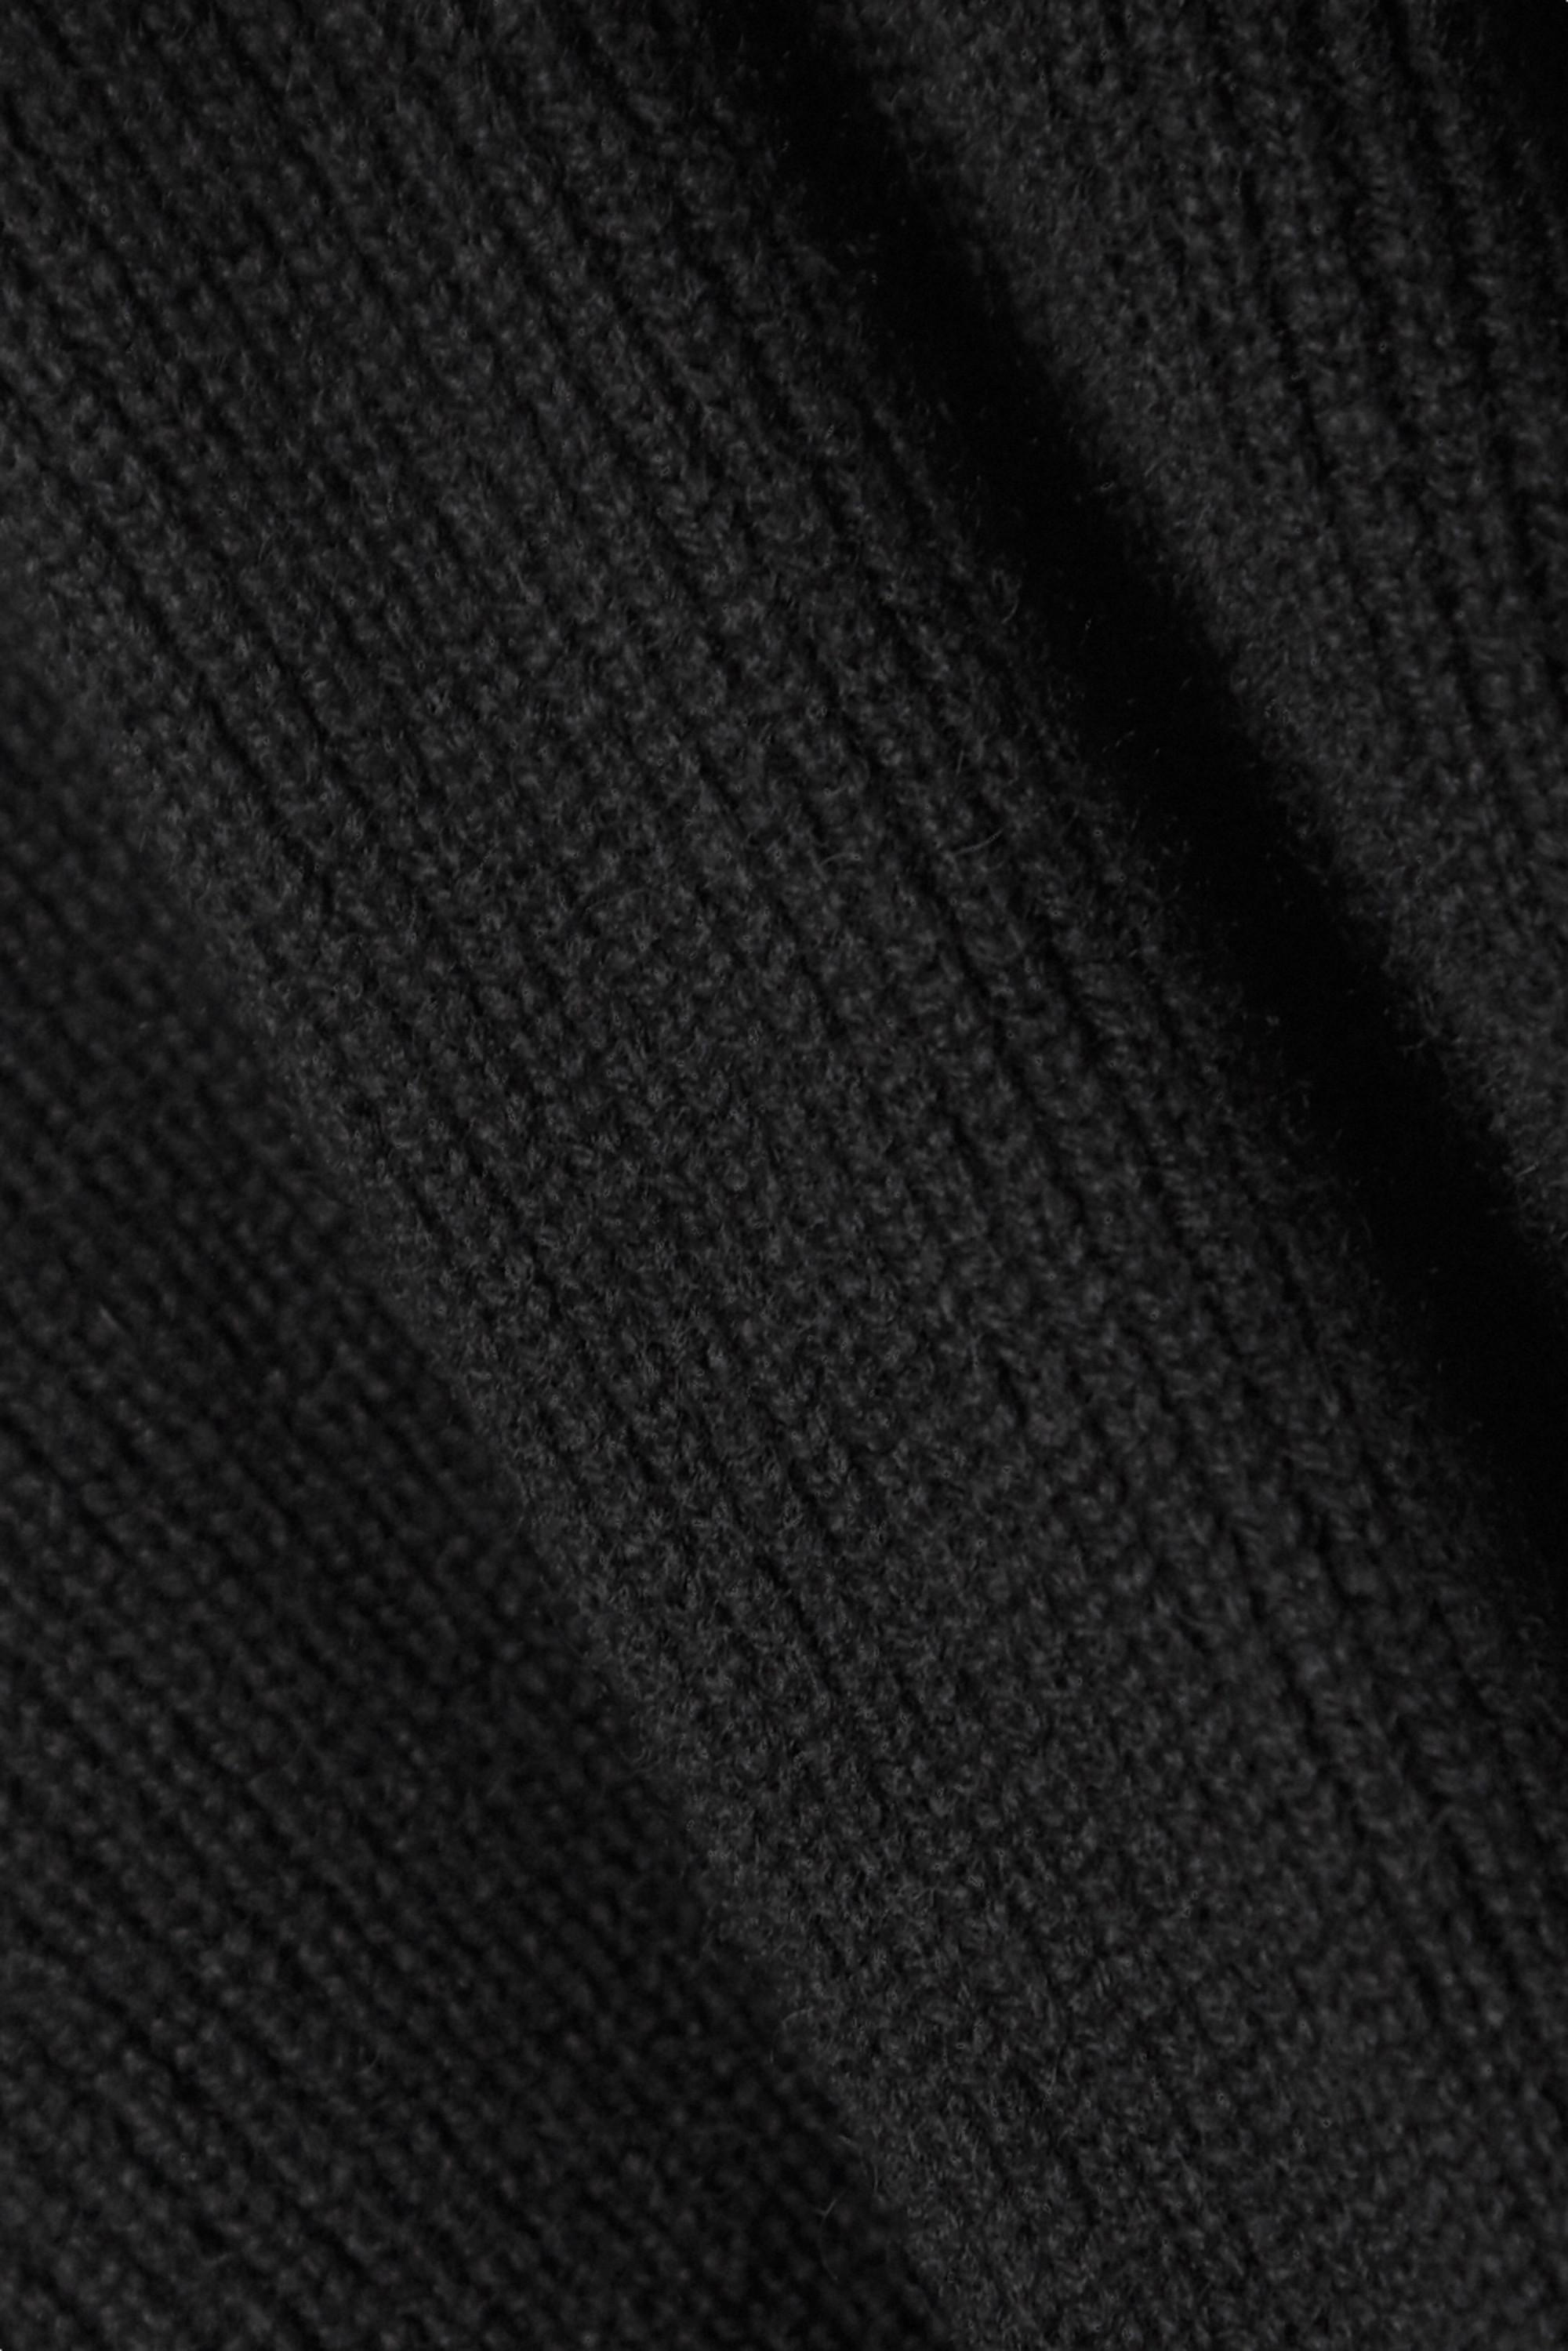 SAINT LAURENT Ribbed cashmere turtleneck sweater